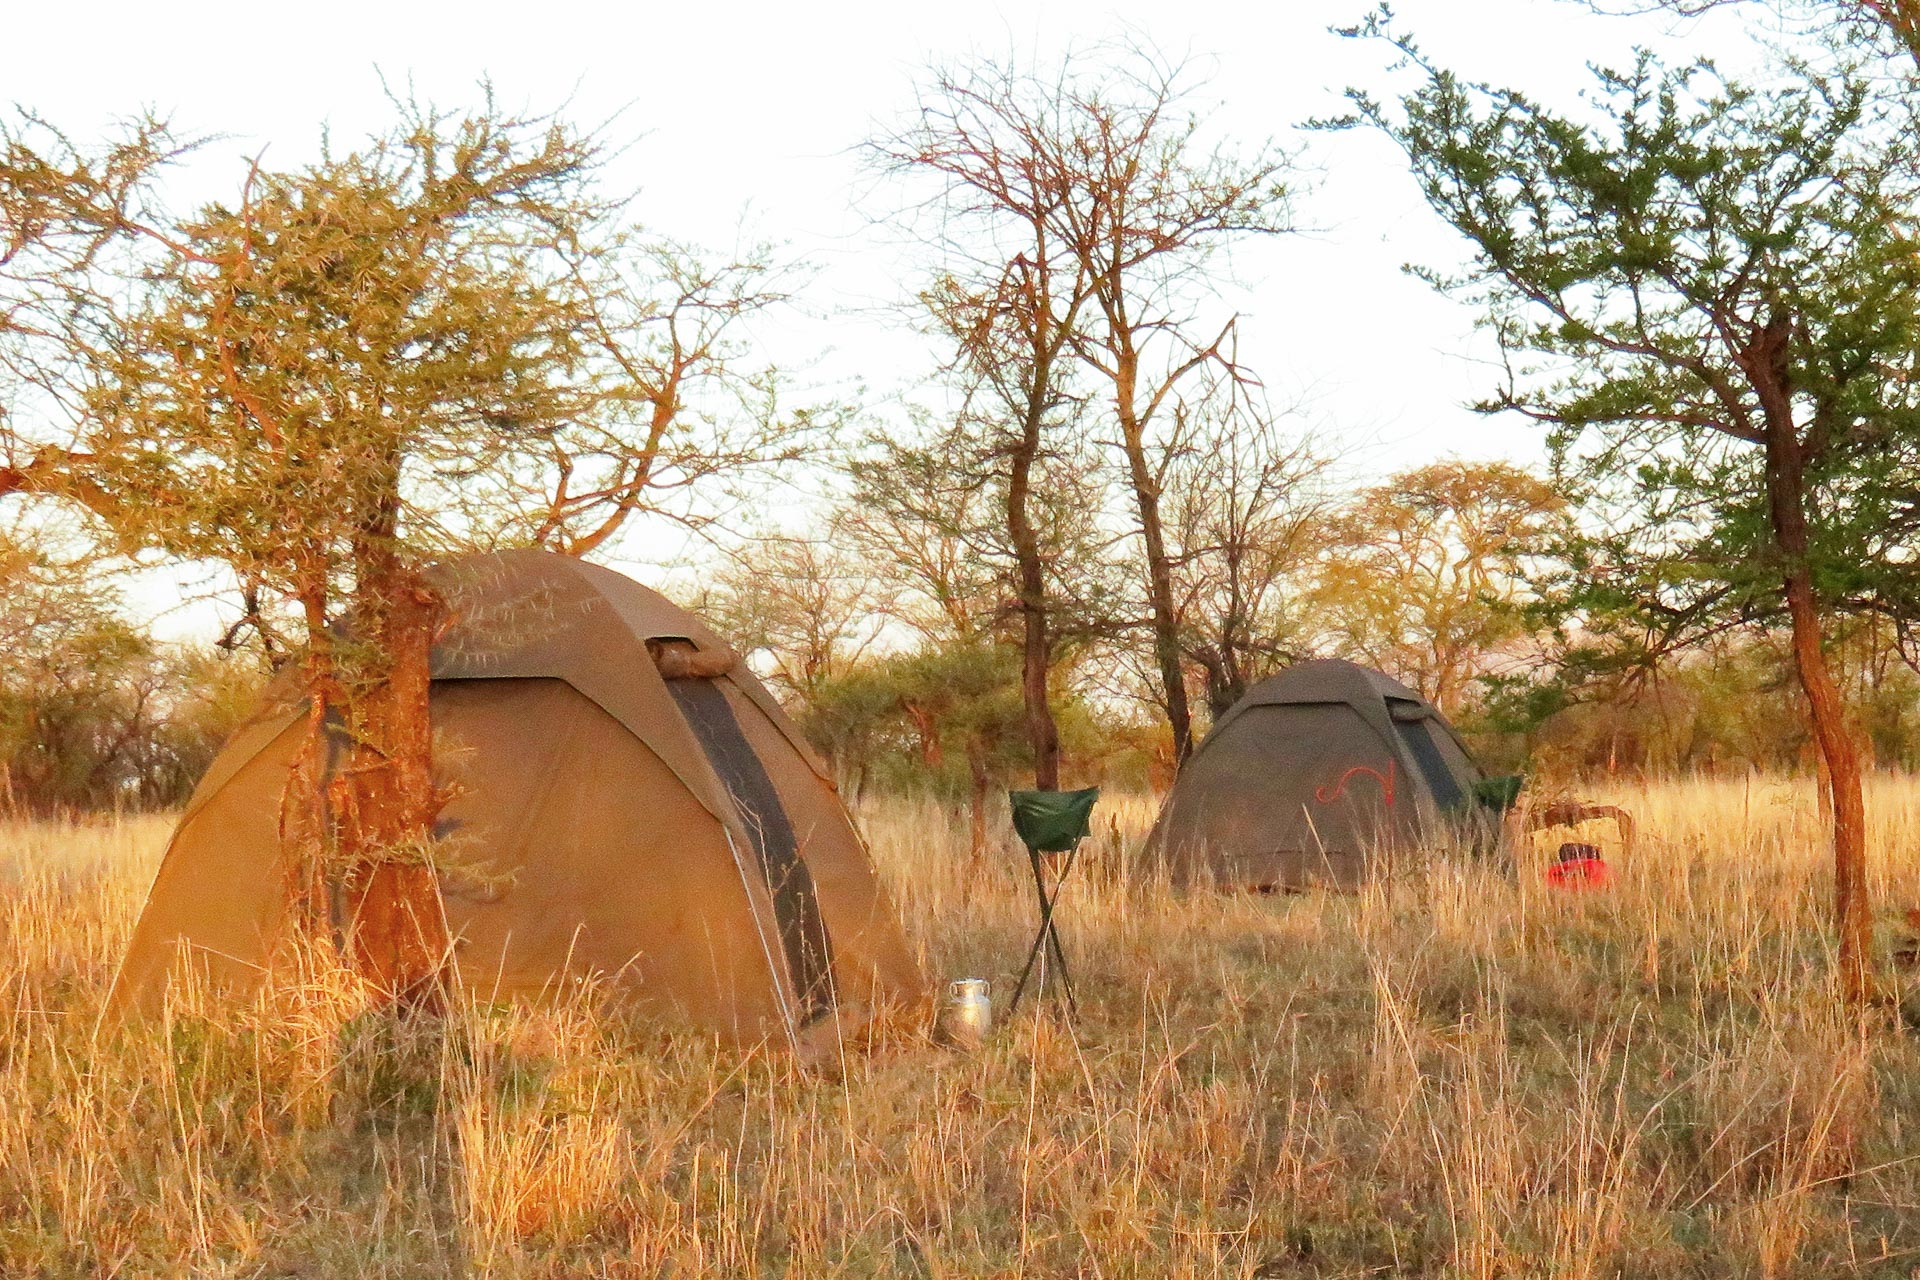 Standard-Zelt-Safari-Tansania-Globetrotter-Select-Kulzer-3